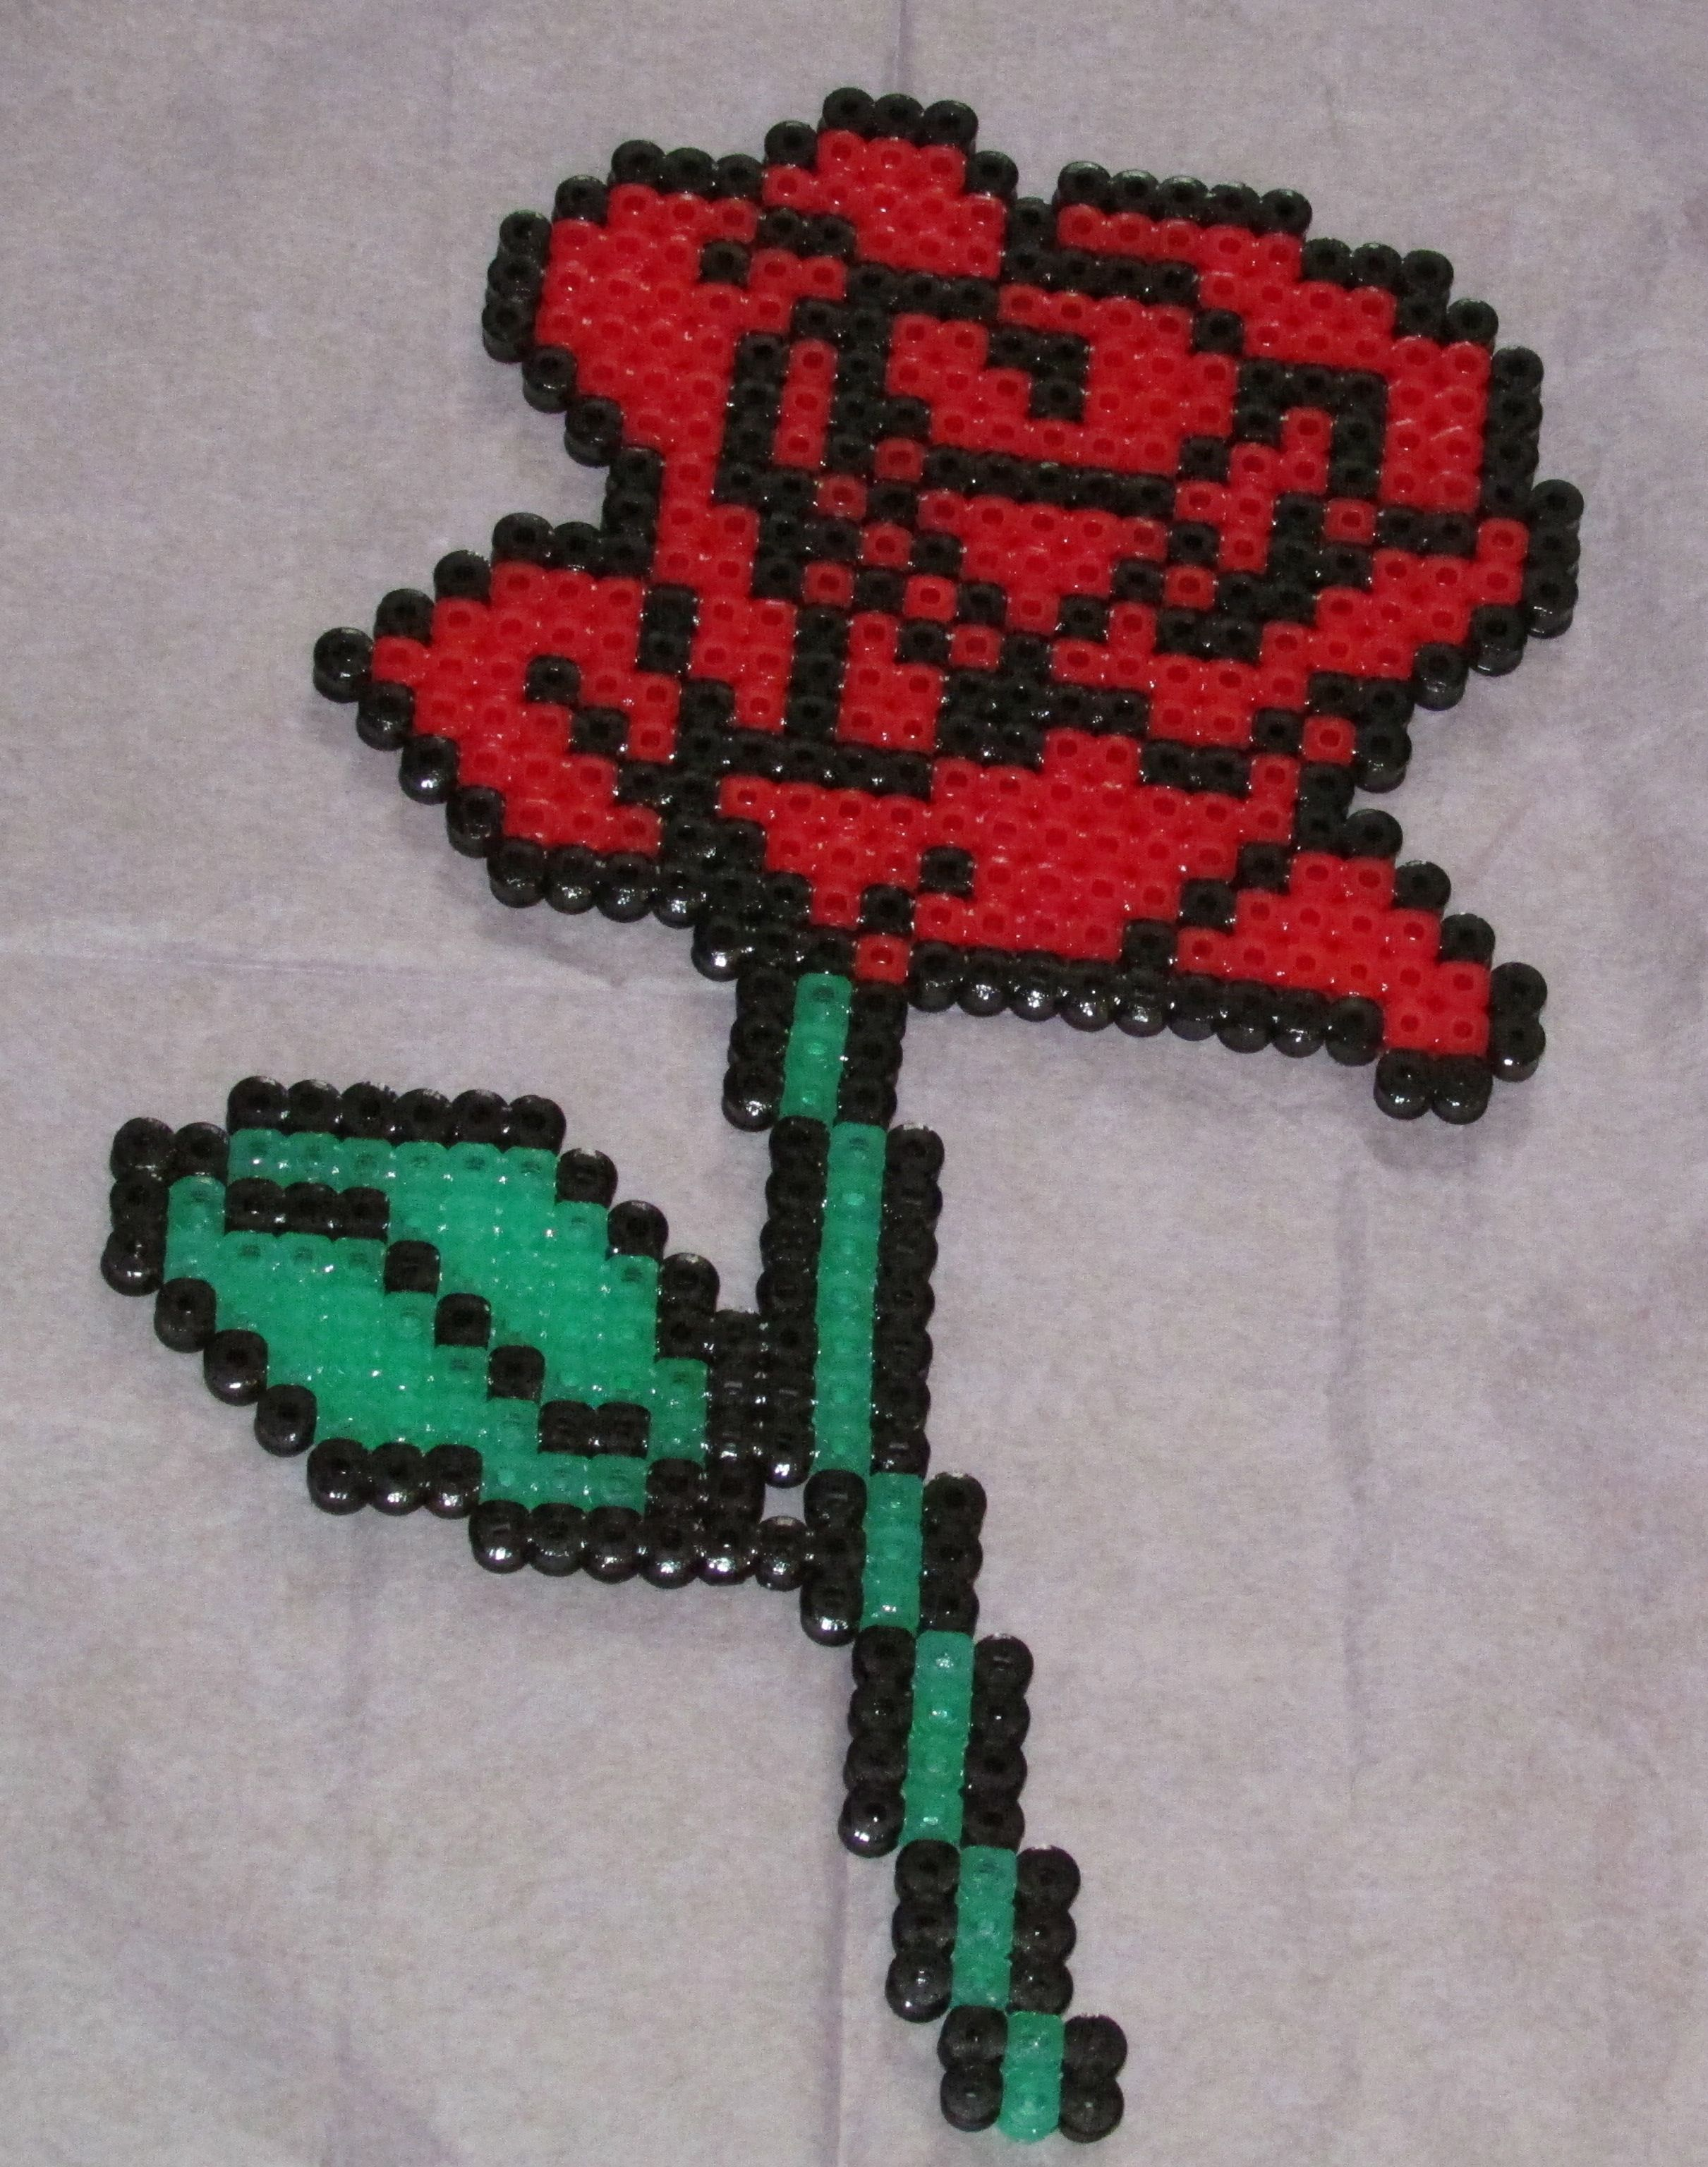 rose hama perler beads by keely jade b gelperlen b gelperlen hama und b gelperlen vorlagen. Black Bedroom Furniture Sets. Home Design Ideas